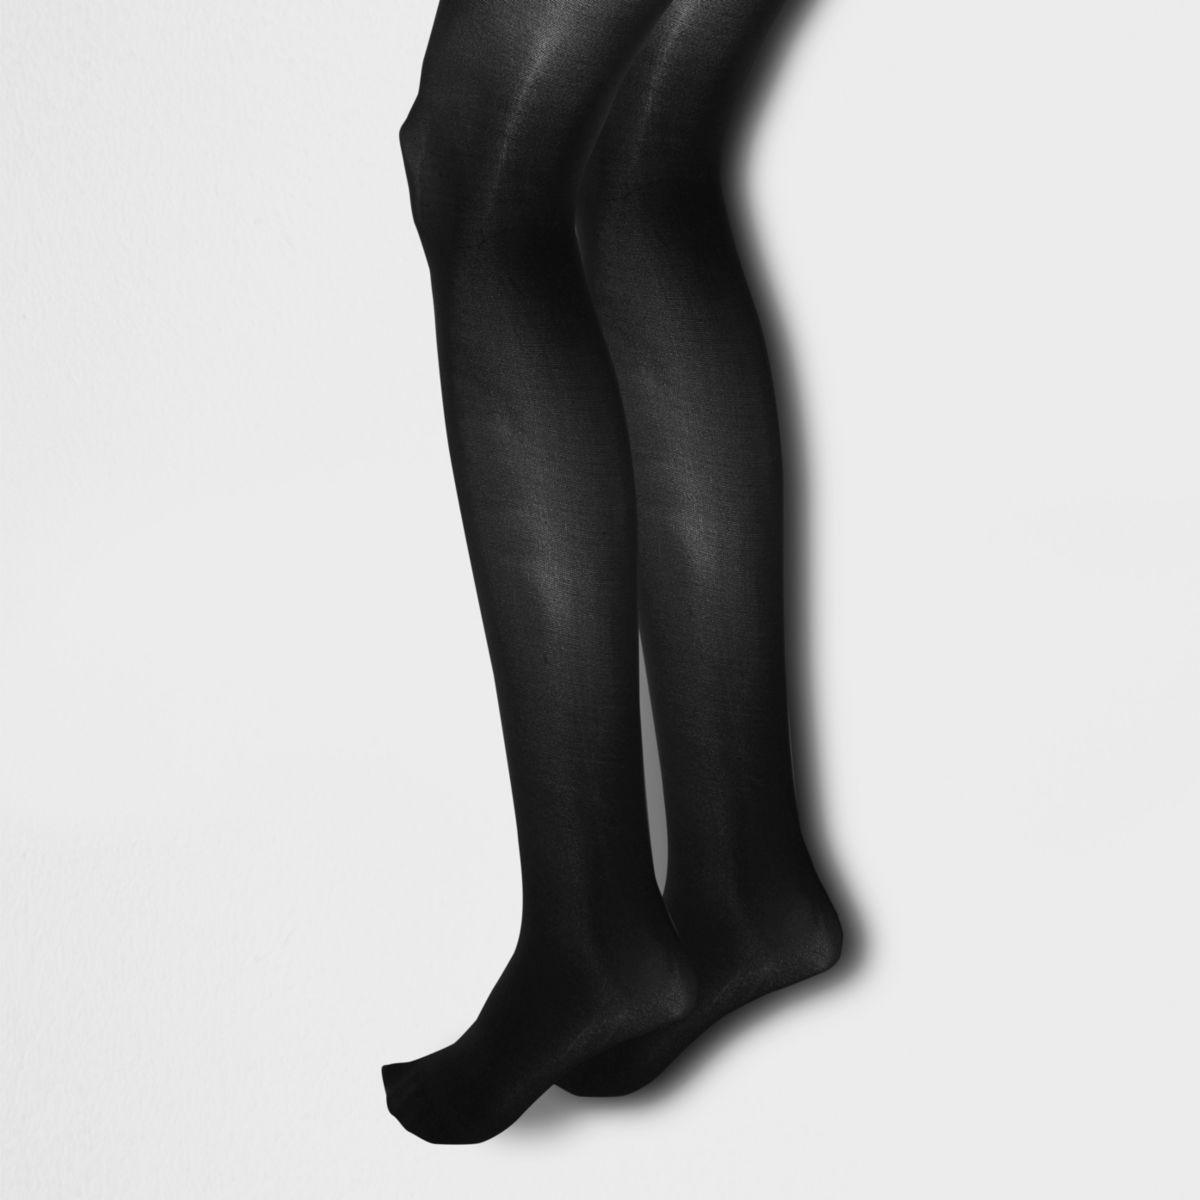 Black 40 denier tights multipack